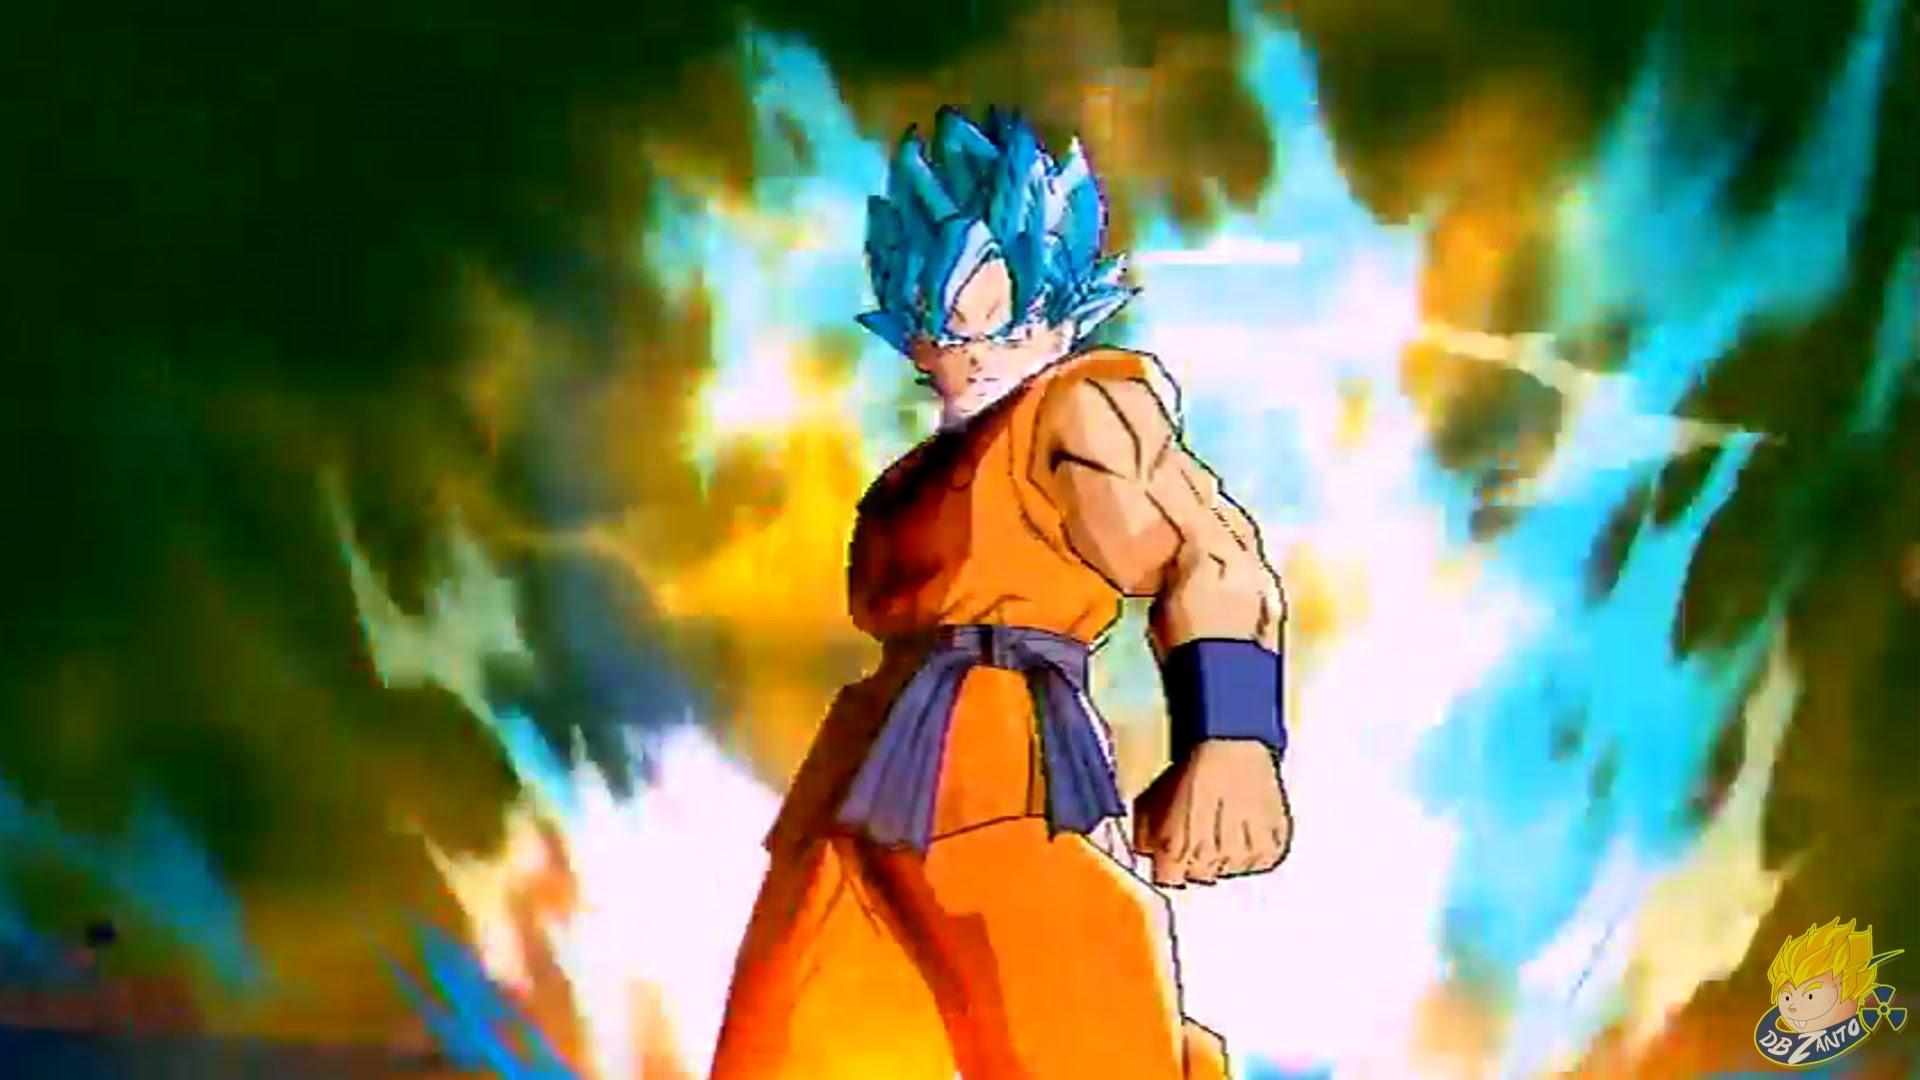 Gokus New Super Saiyan [SSGSS] Transformation RevealedFULL HD 1920x1080